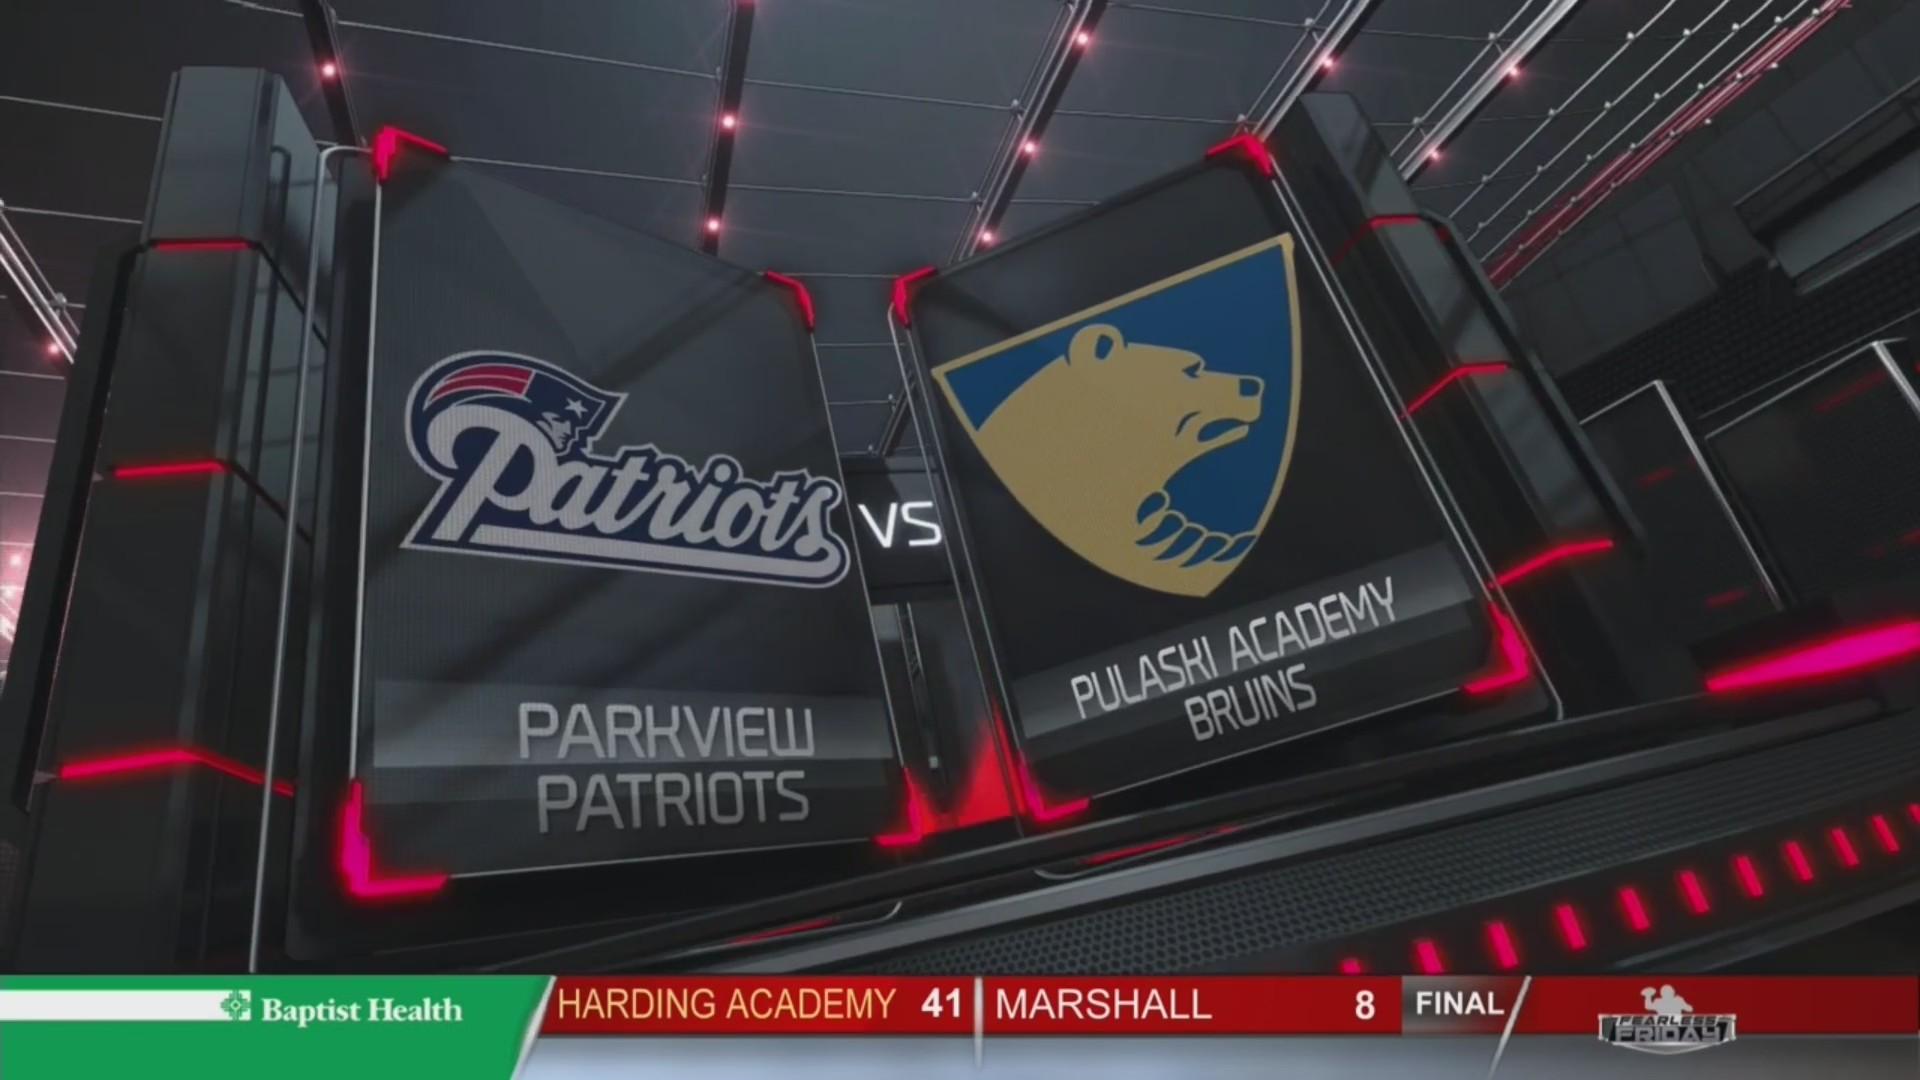 Parkview_vs__Pulaski_Academy_0_20181020052501